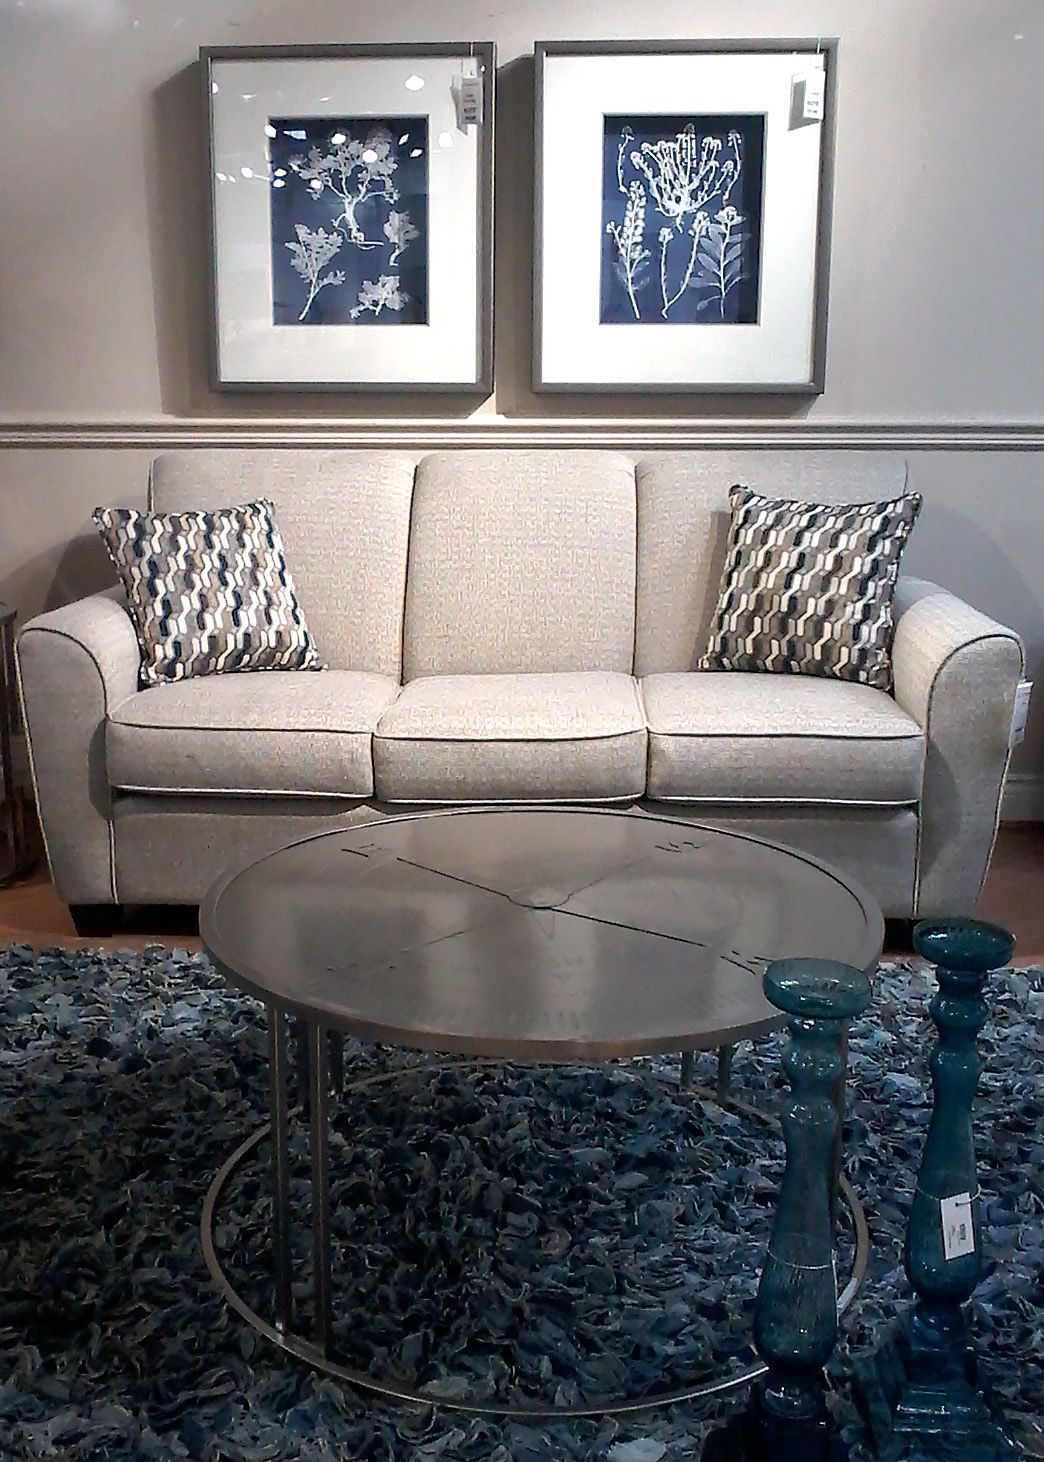 Sofa Decor Rest Jcperreault Sofa Decor Home Decor Furniture